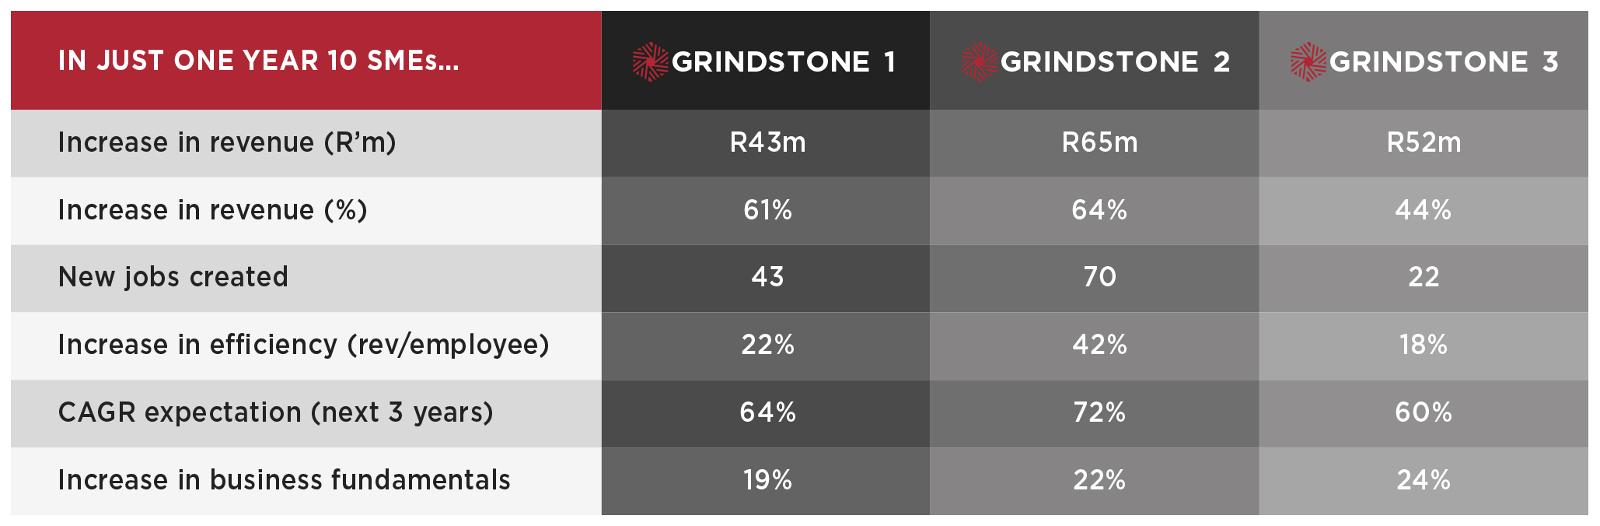 grind-performance